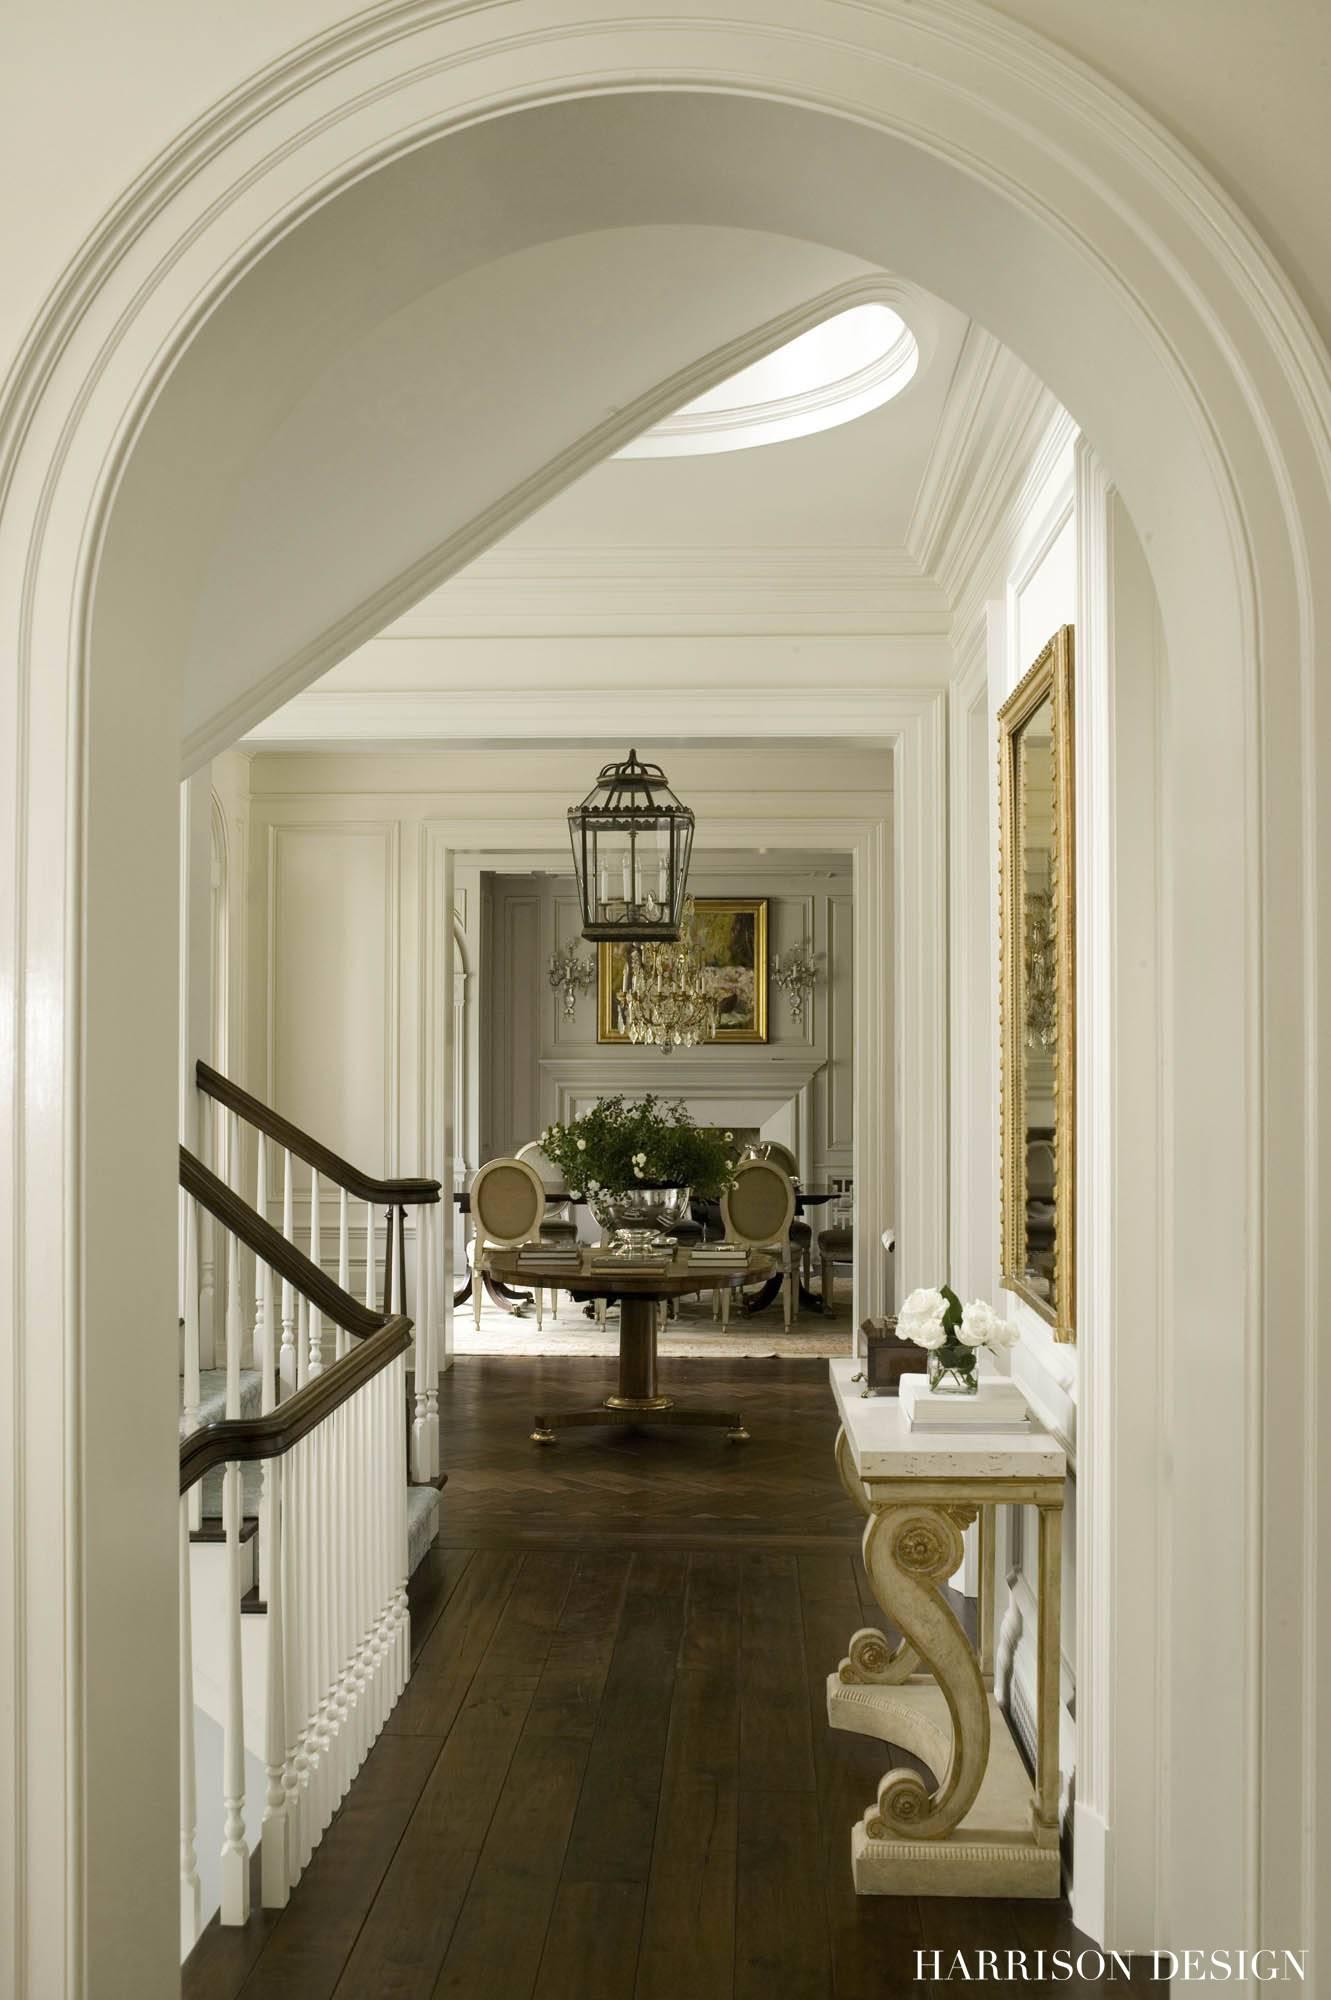 American Colonial Interior Design : american, colonial, interior, design, American, Colonial, Harrison, Design